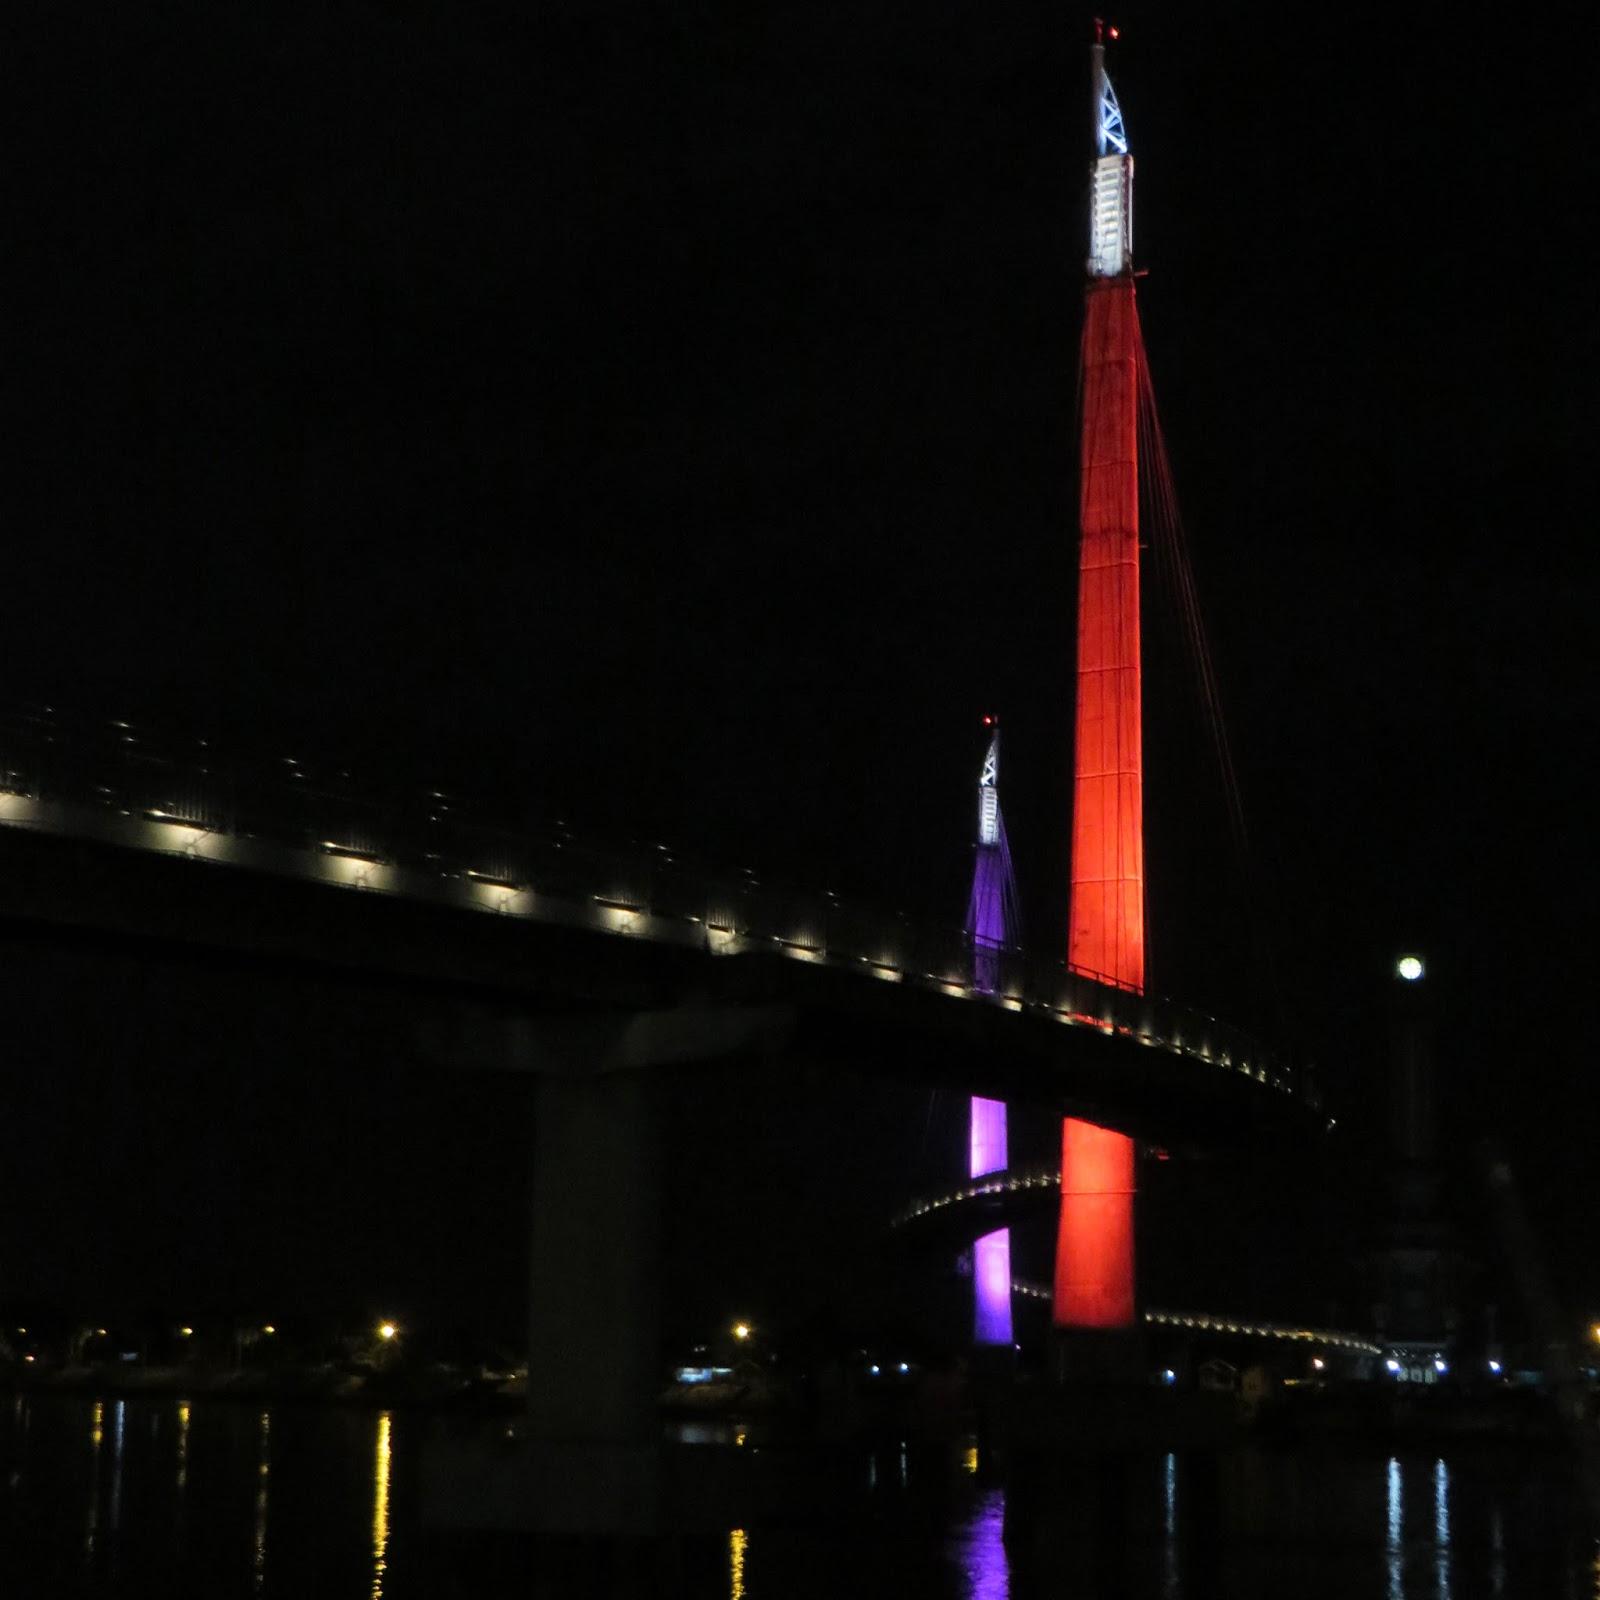 Jembatan Gantung Pedestrian Menara Gentala Arasy Buah Pikiran Berjalan Kota